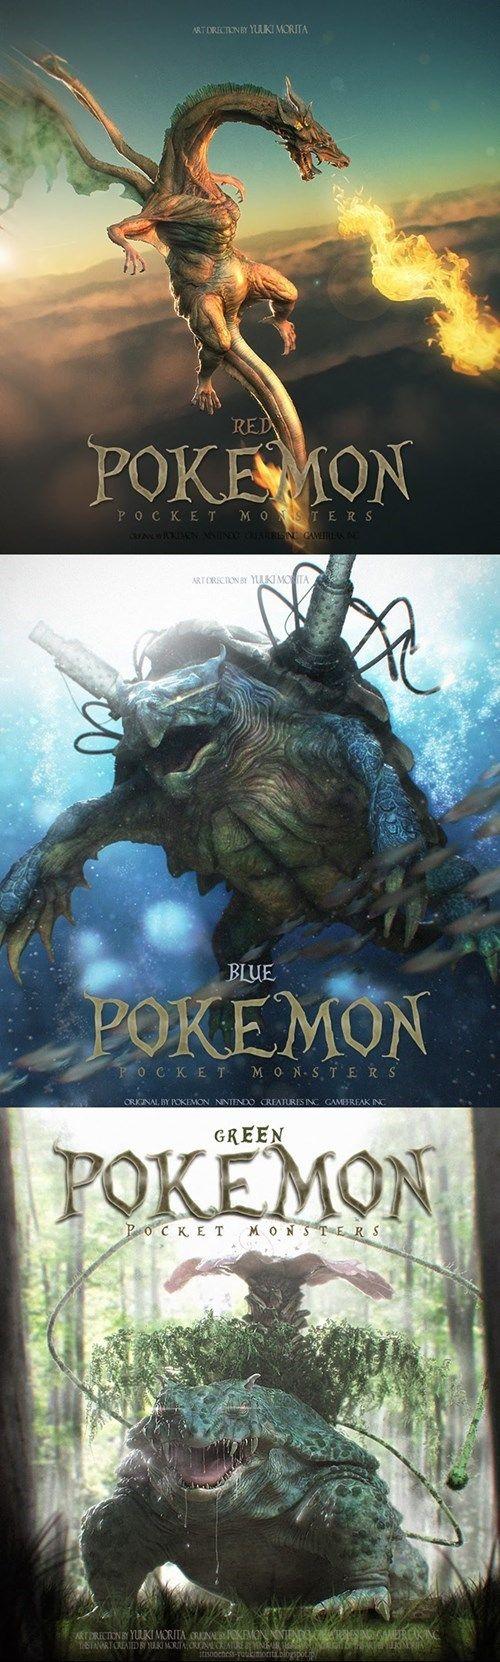 Hyperrealistic 3D Illustrations of Pokémon Characters